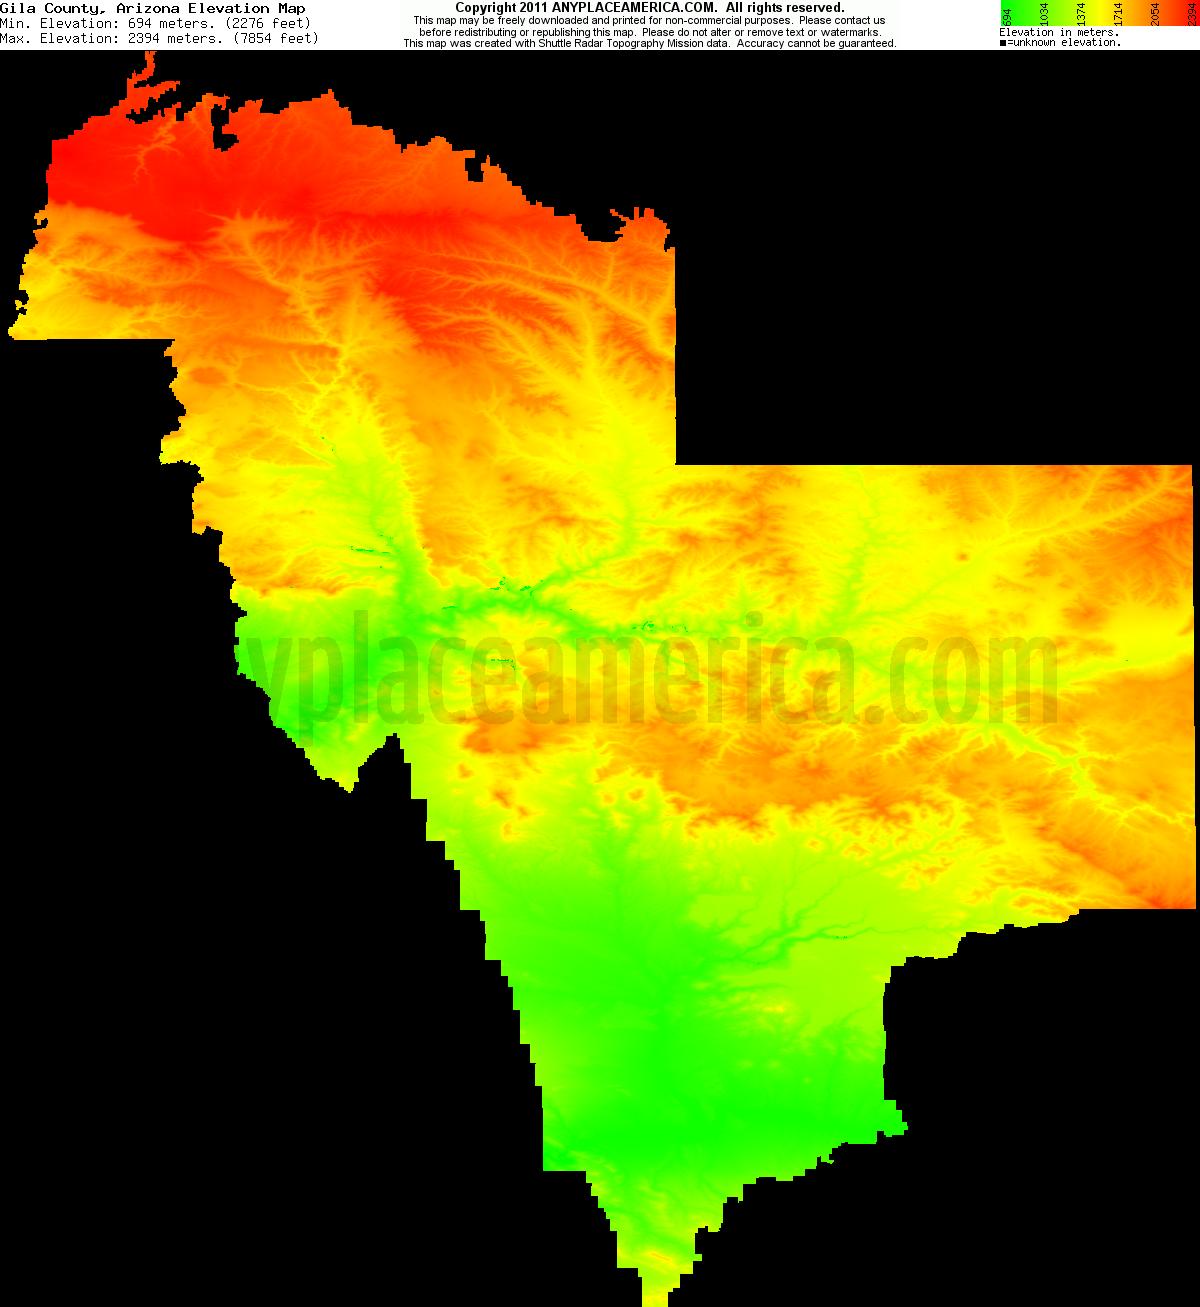 Arizona gila county young - Download Gila County Elevation Map